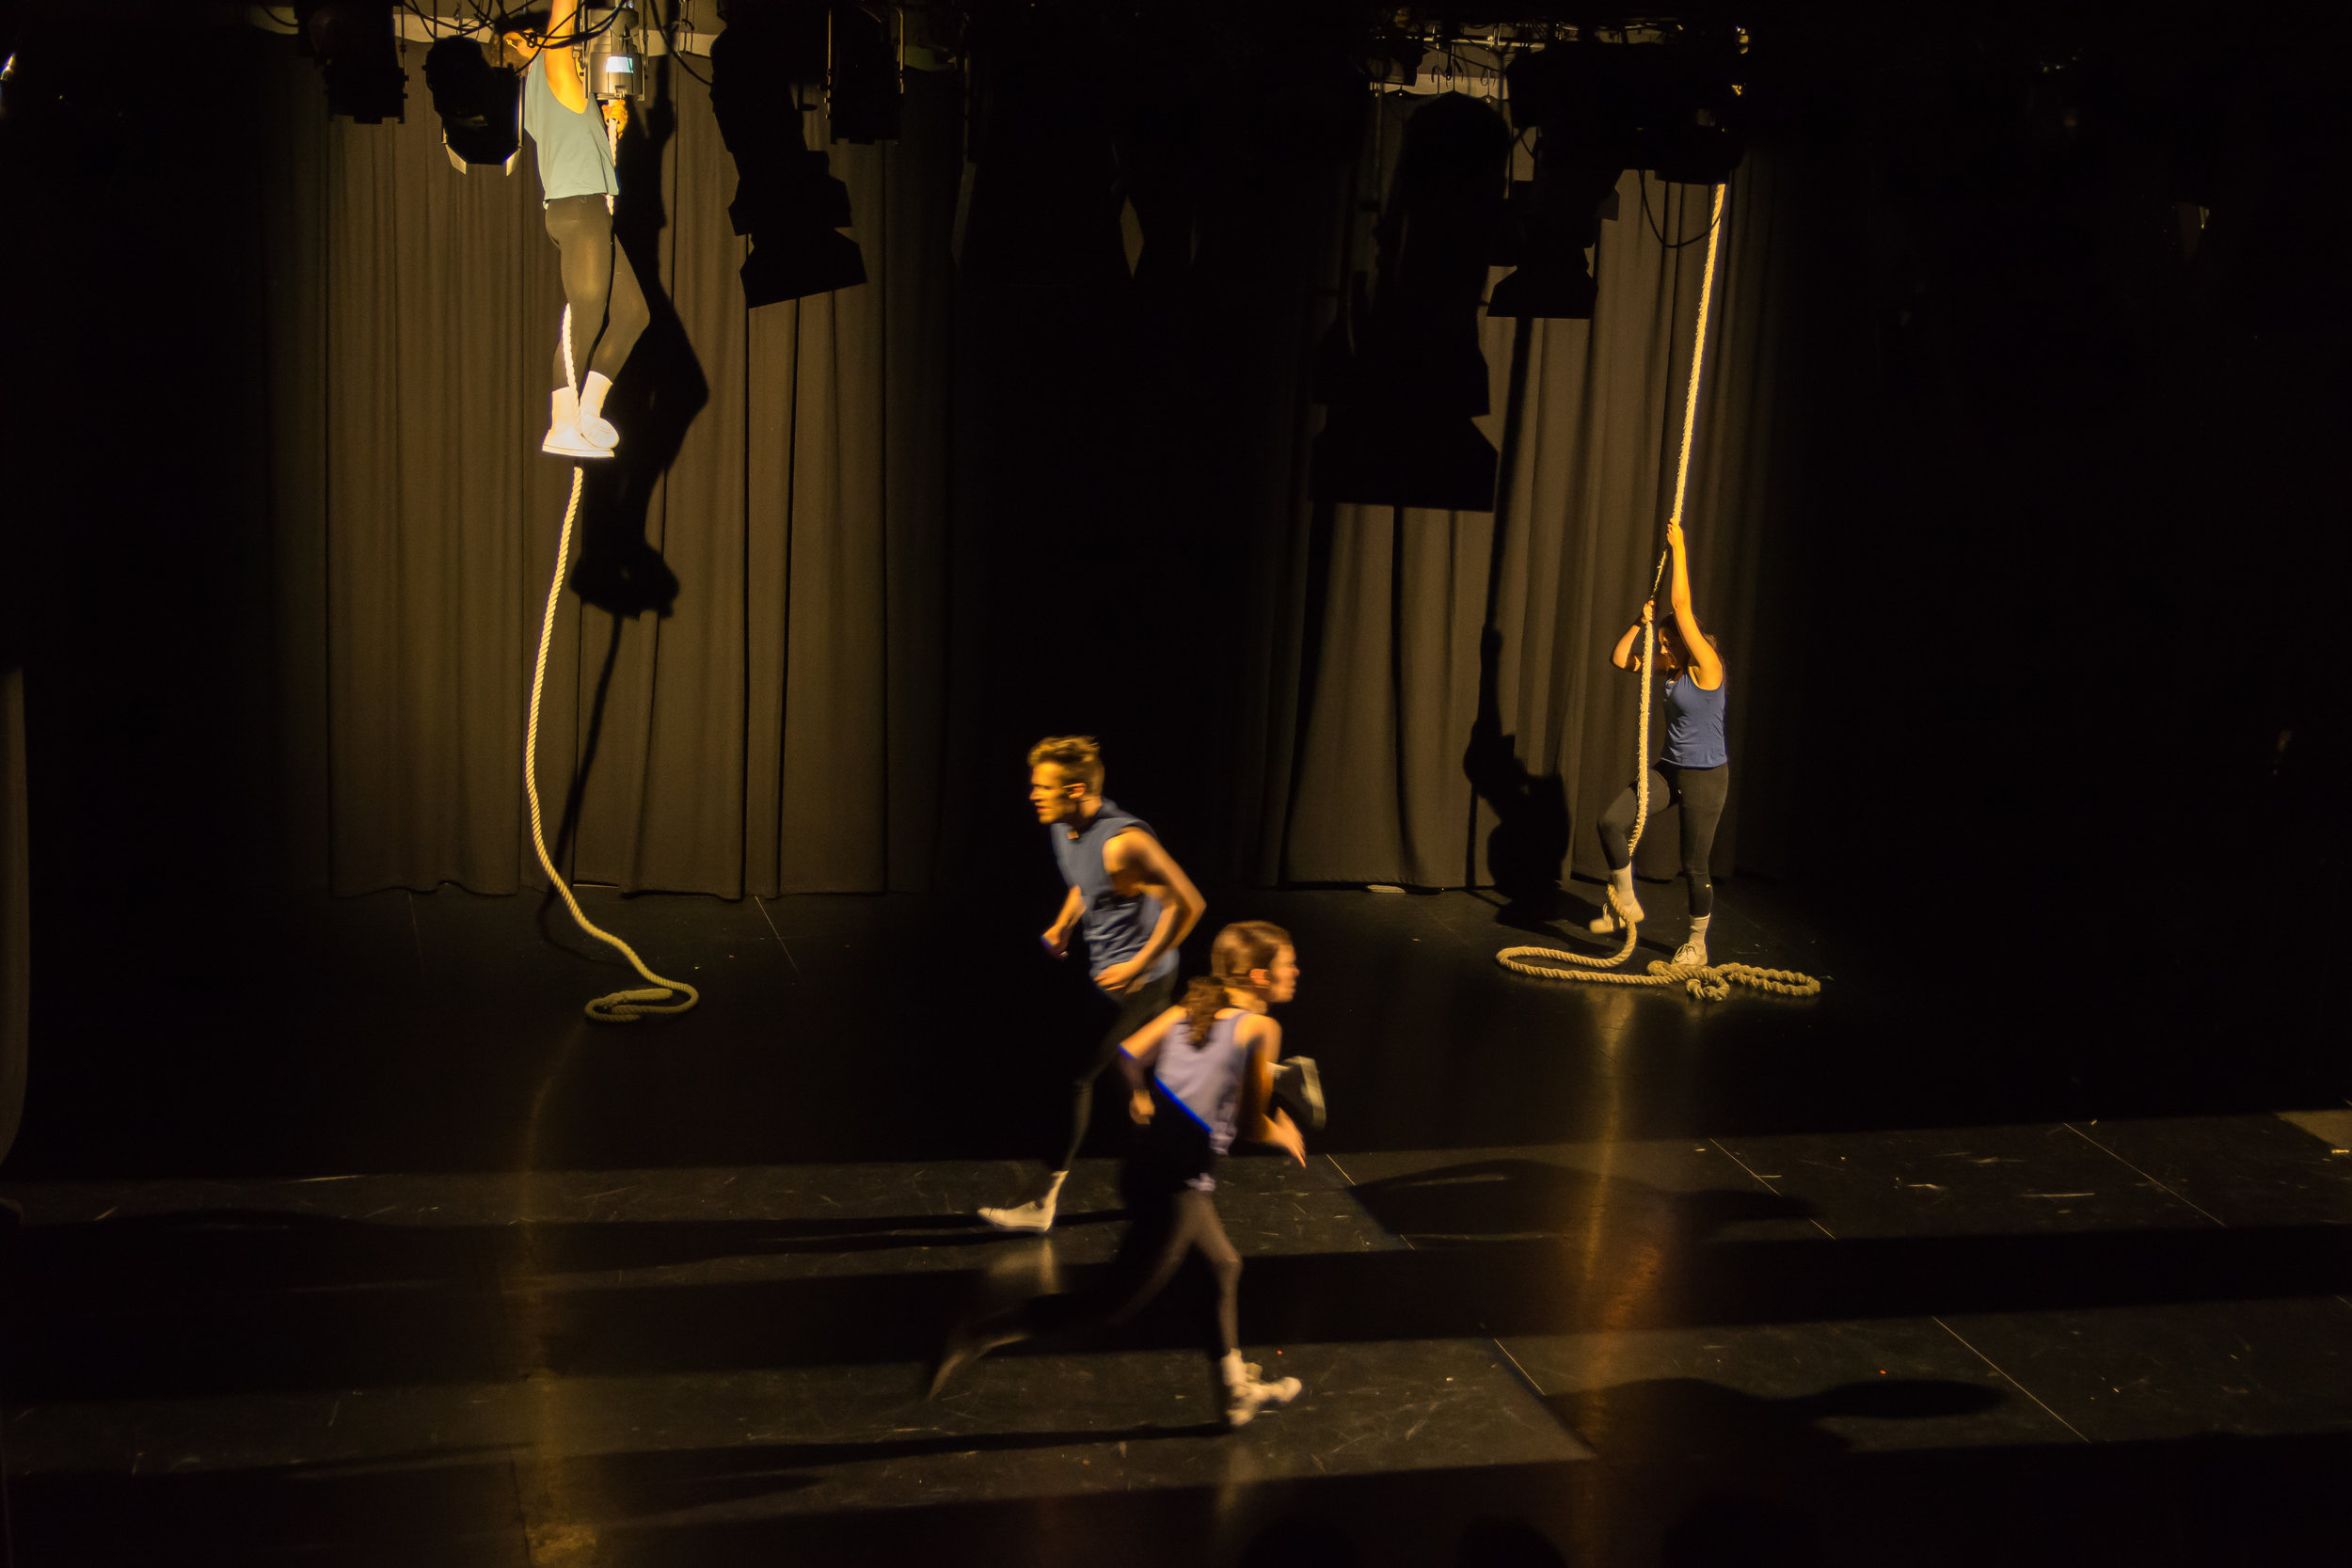 Performers struggling during the 'Endurance' vignette